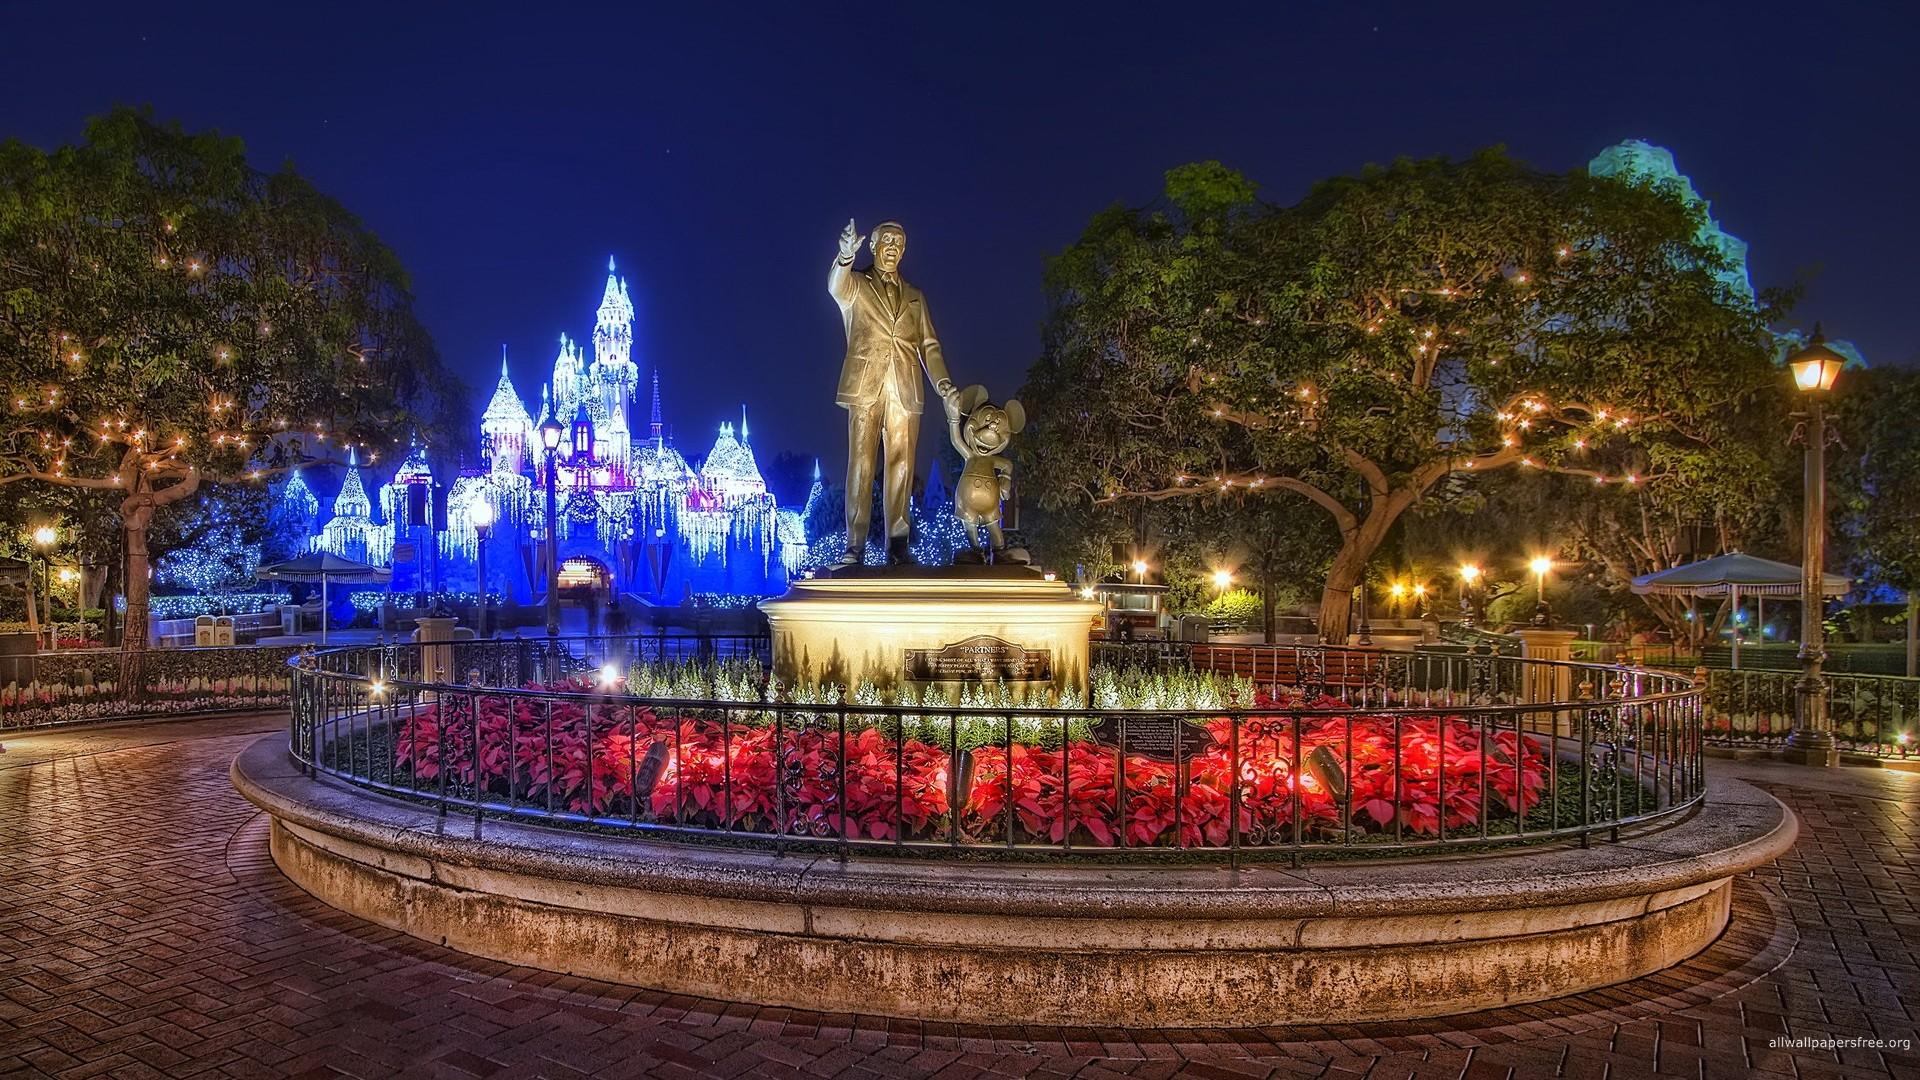 Disney World wallpaper ·① Download